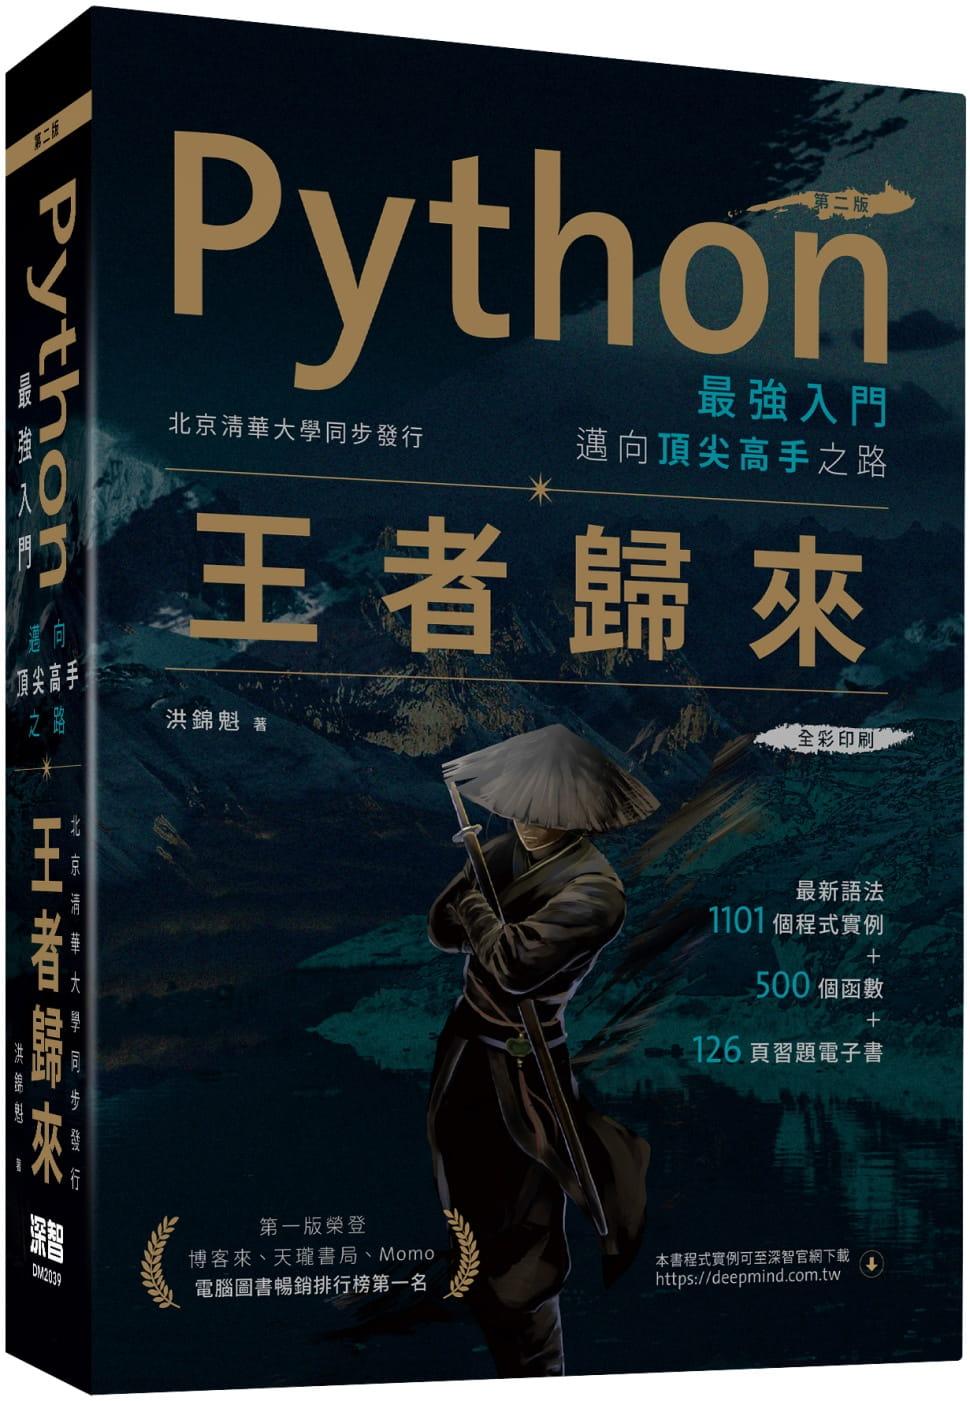 Python 入門到精通 完整案例推薦書